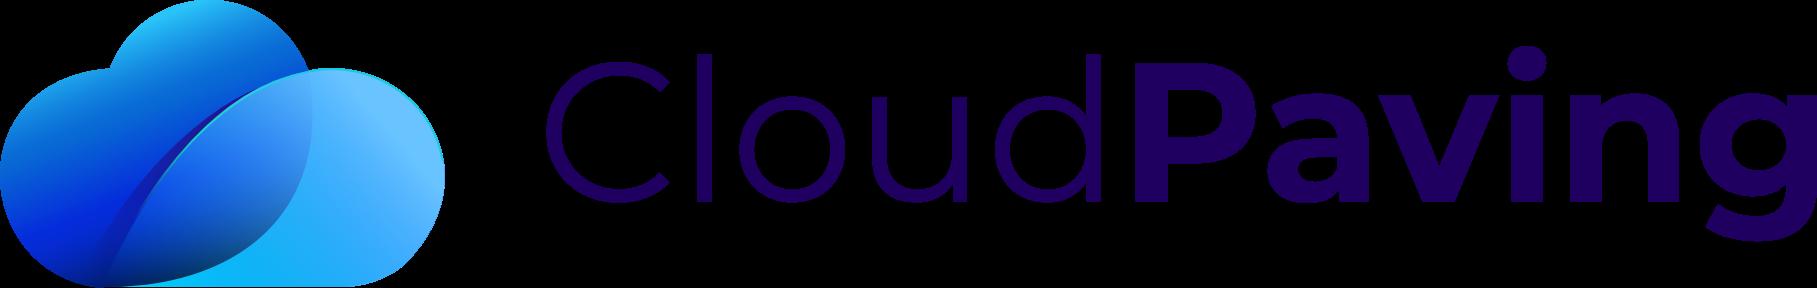 cloud paving surrey logo